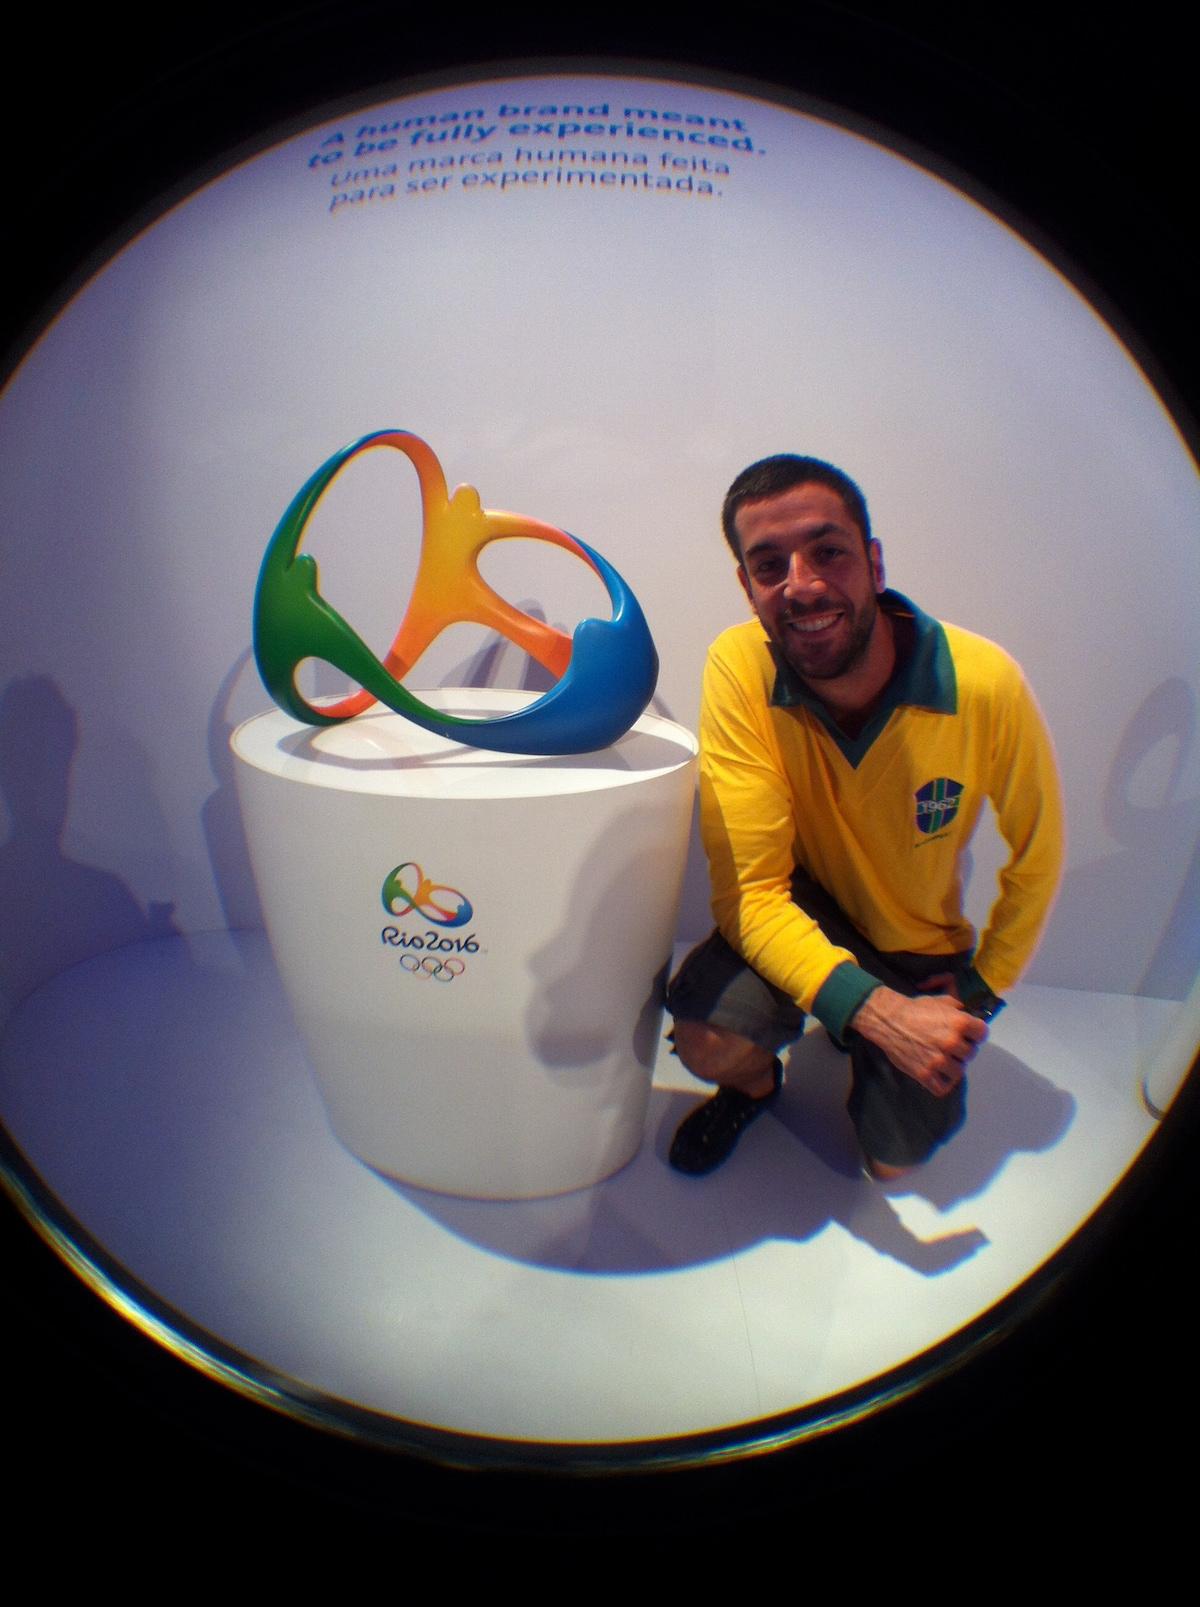 Diogo from Rio